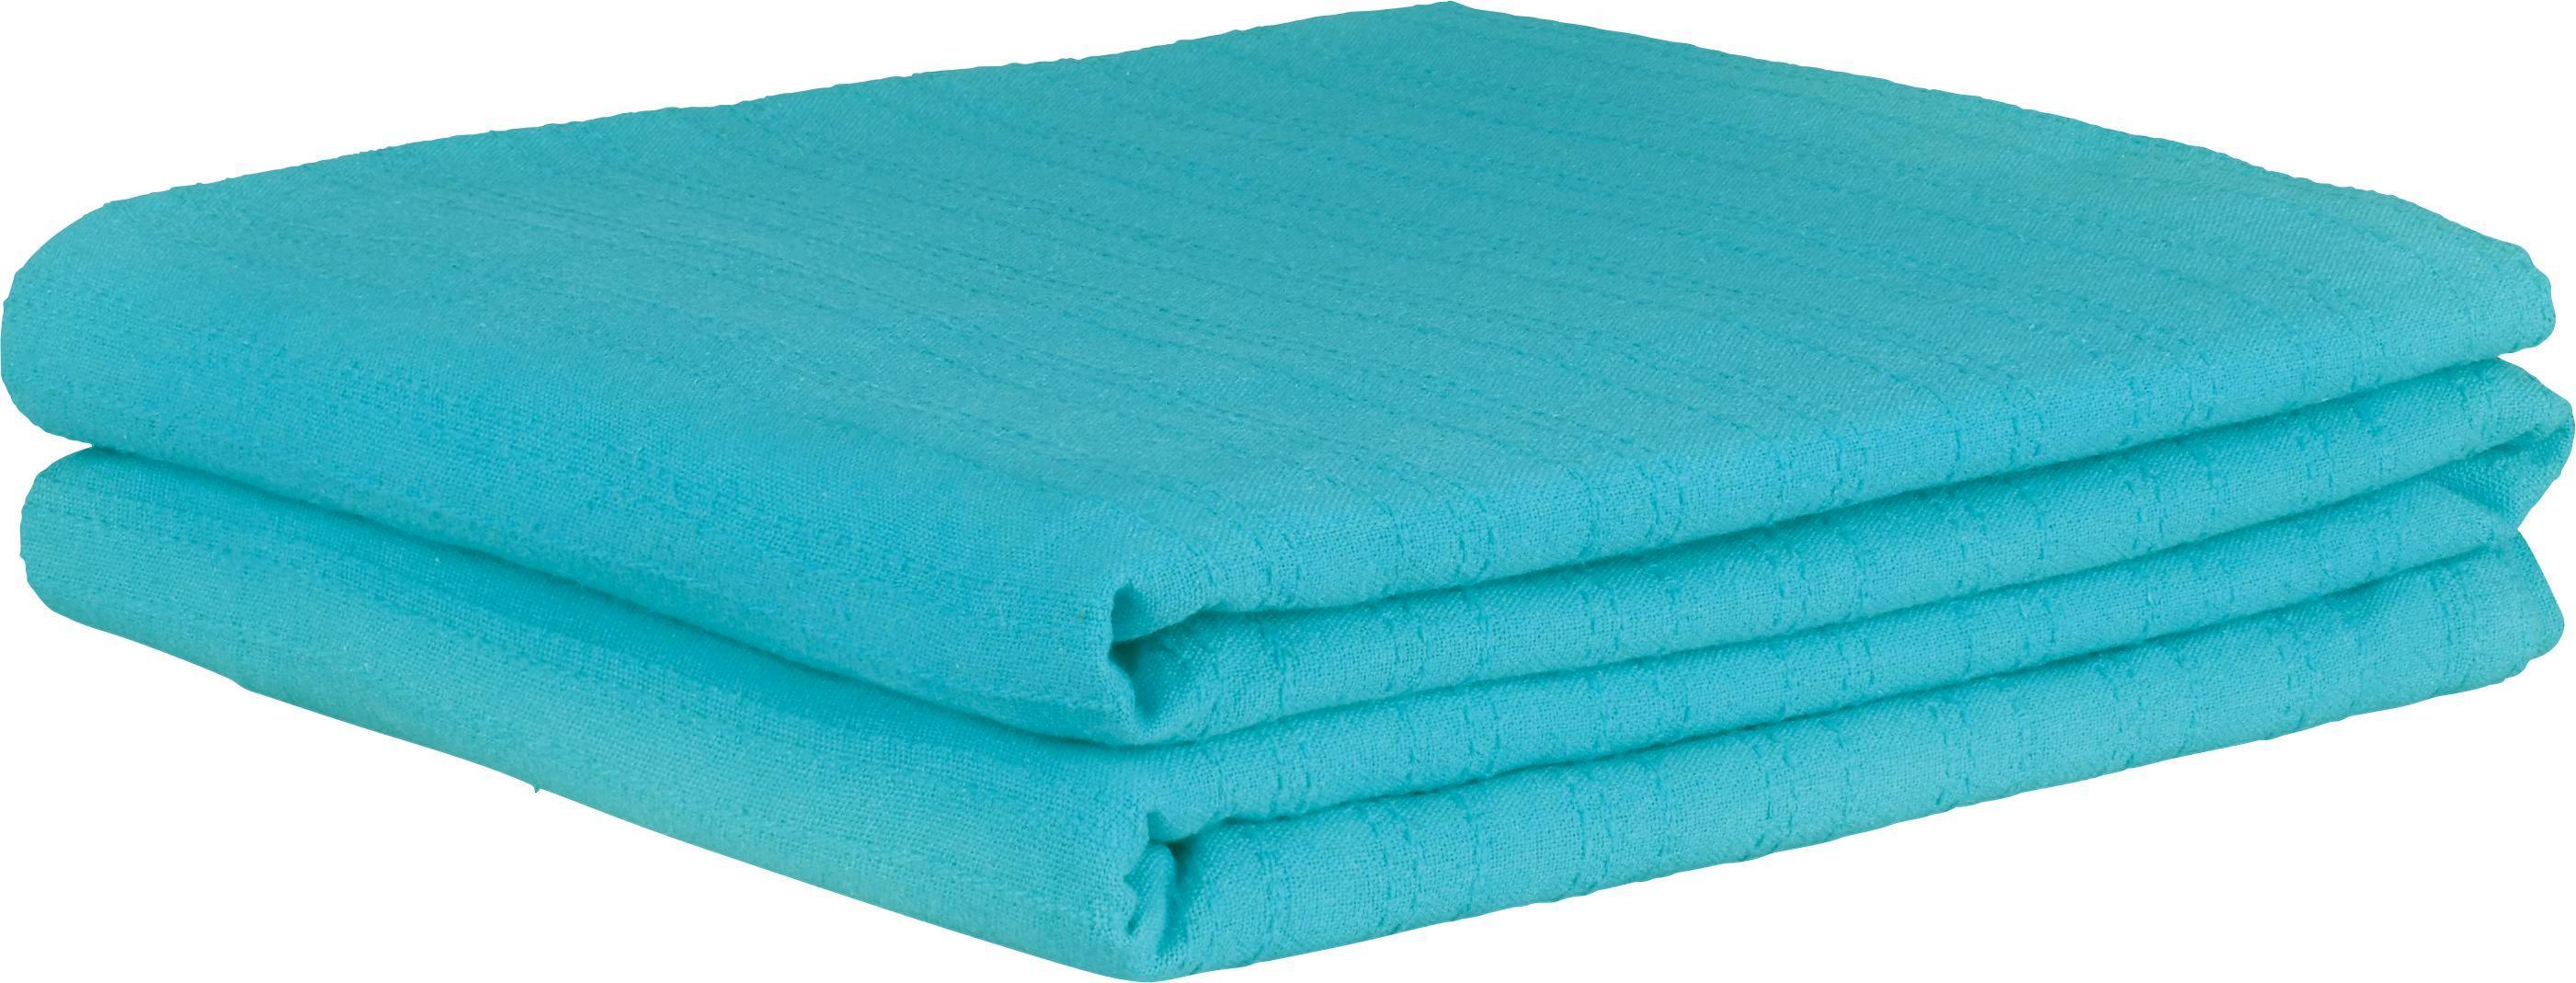 Ágytakaró Solid One - petrol, textil (240/210cm)